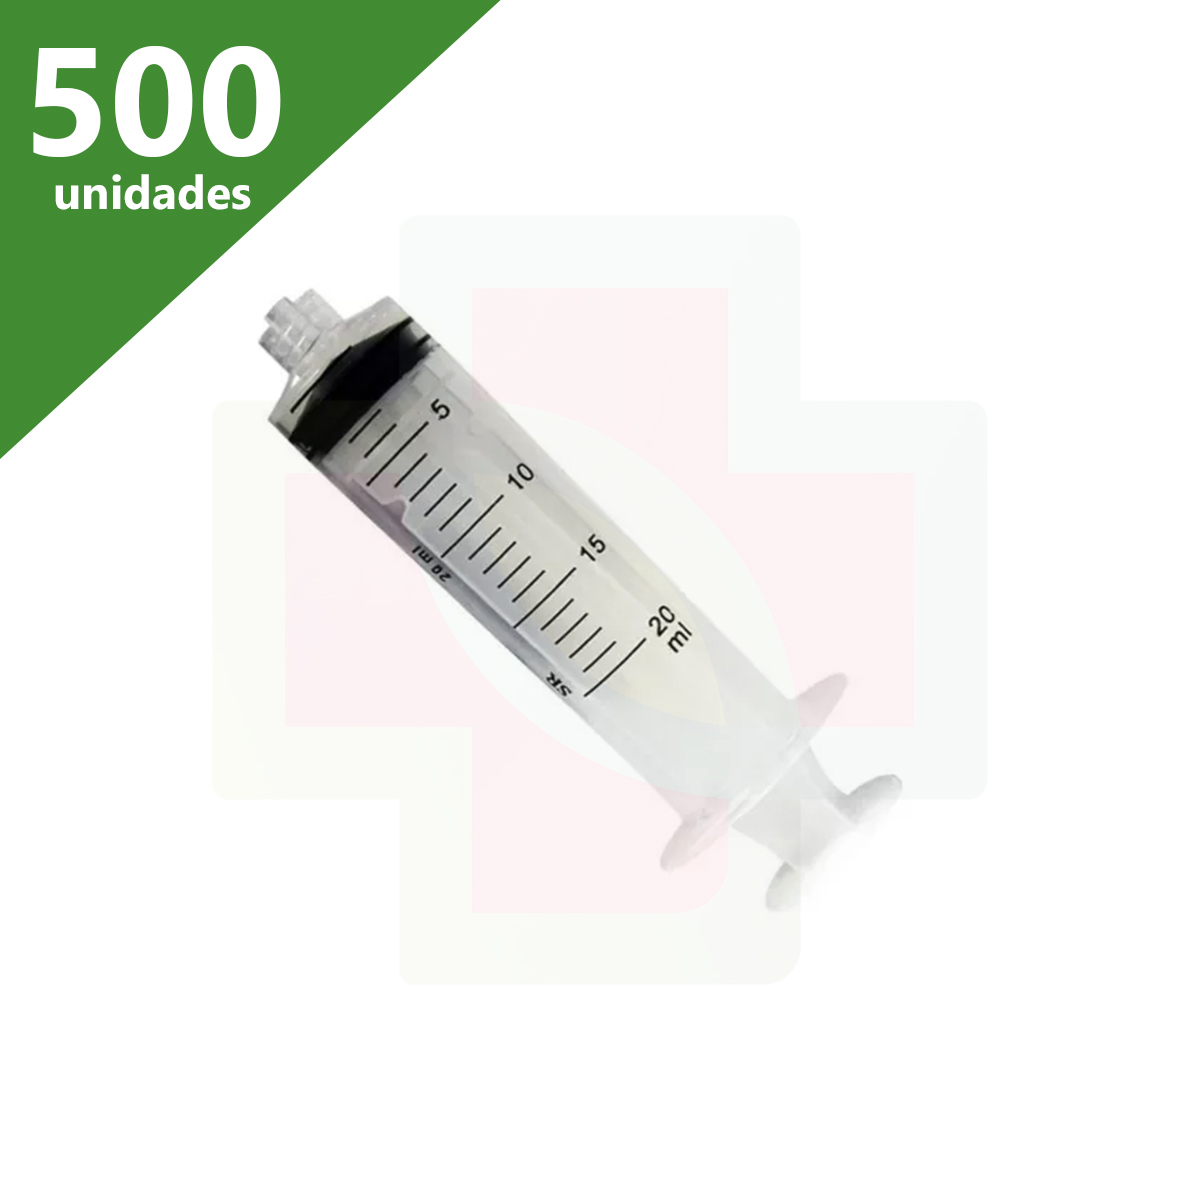 SERINGA DESCARTÁVEL 20 ML SEM AGULHA LUER LOCK (C/500 UNDS) - SR